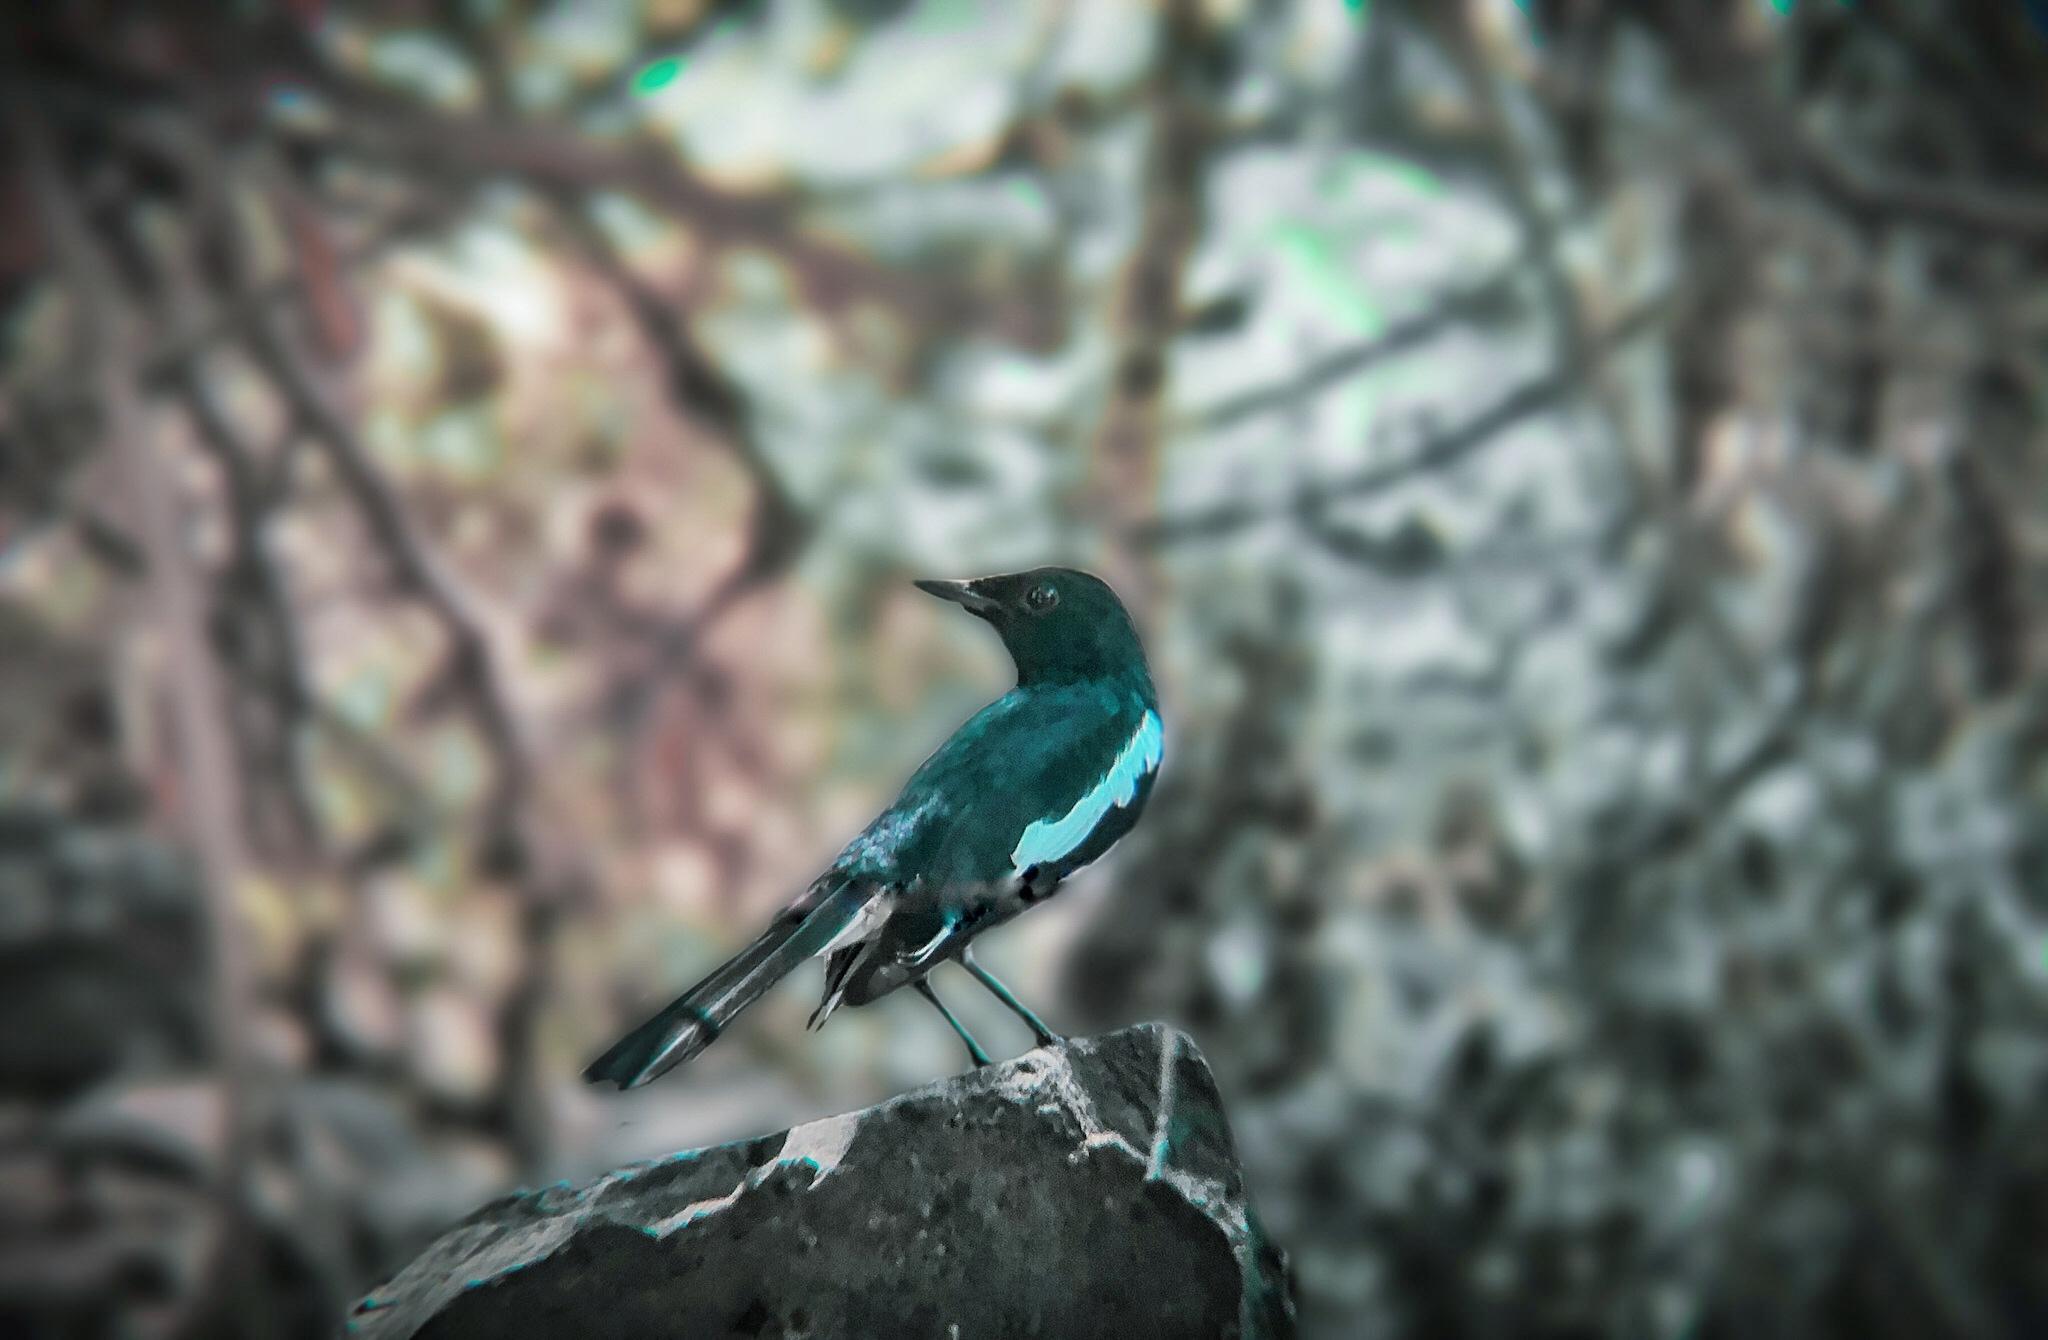 Bird sitting on the rock